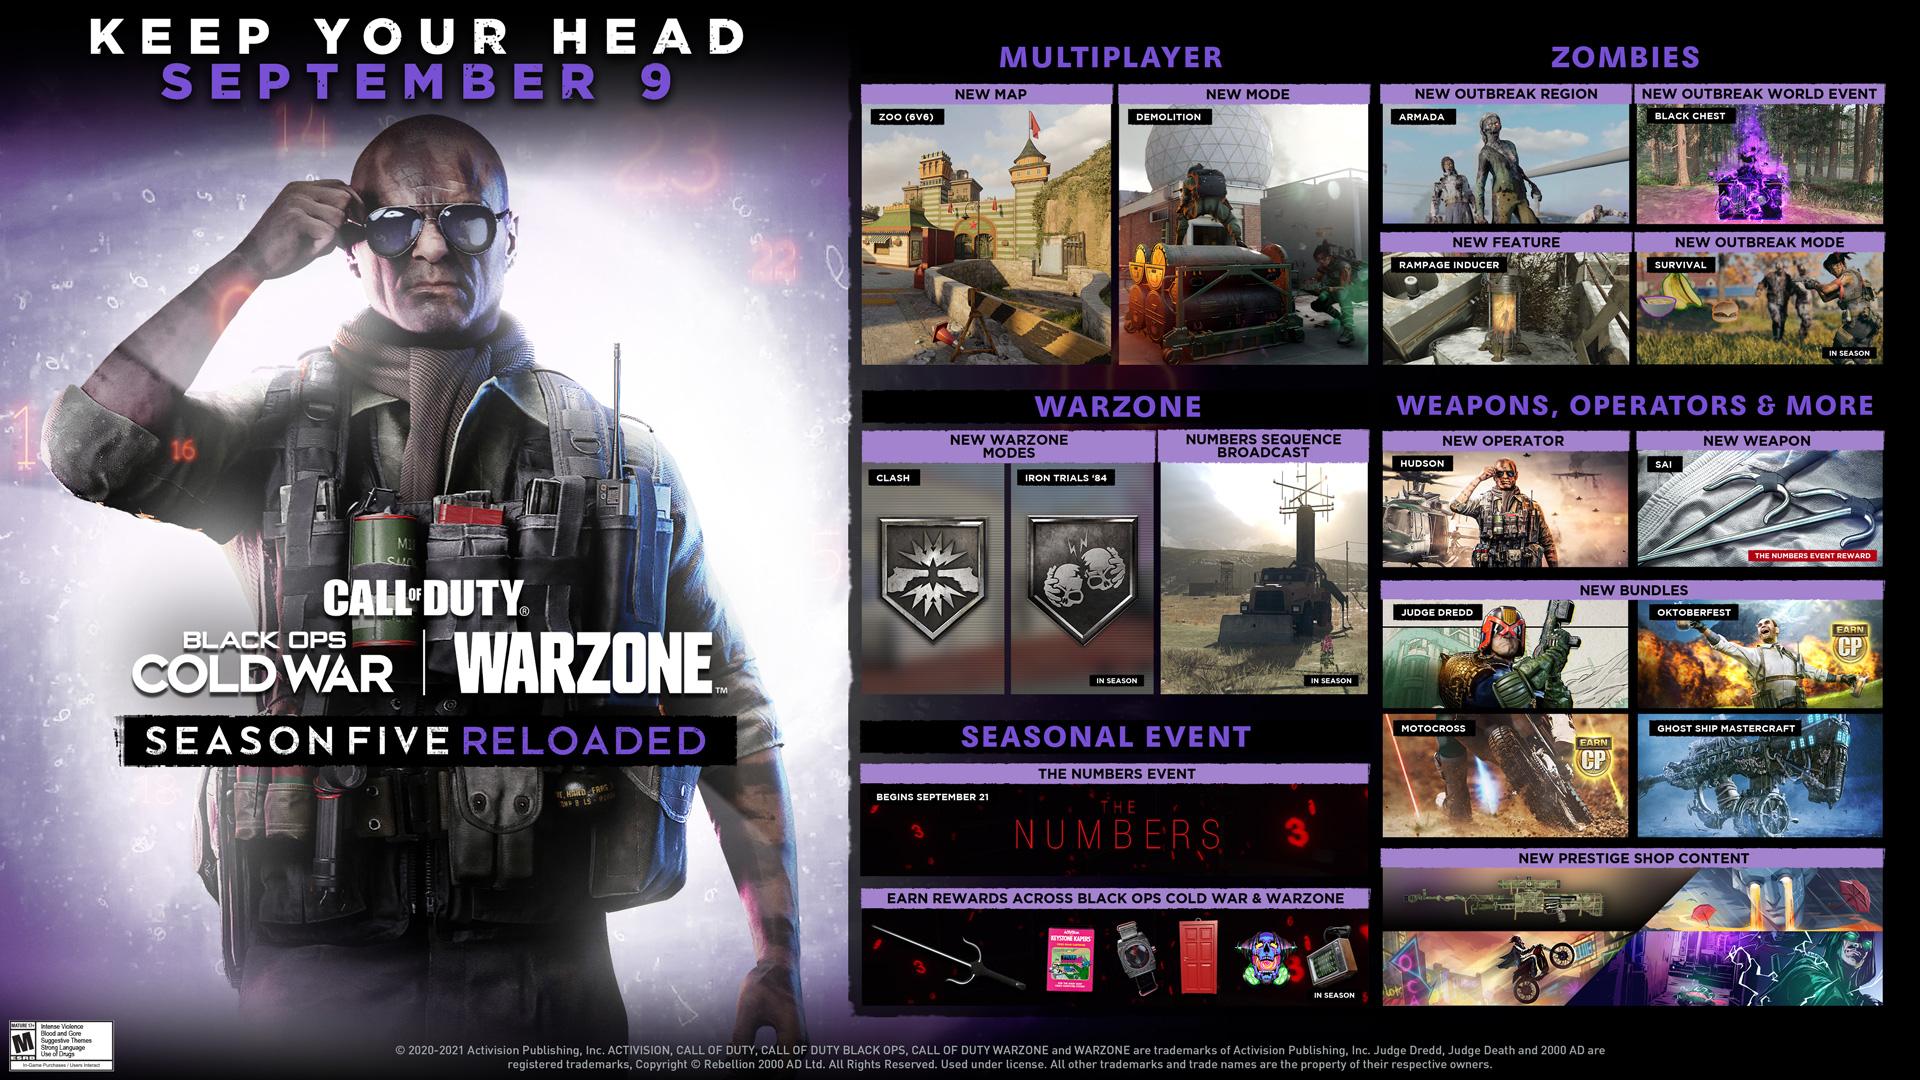 The Call of Duty: Warzone Season 5 Roadmap